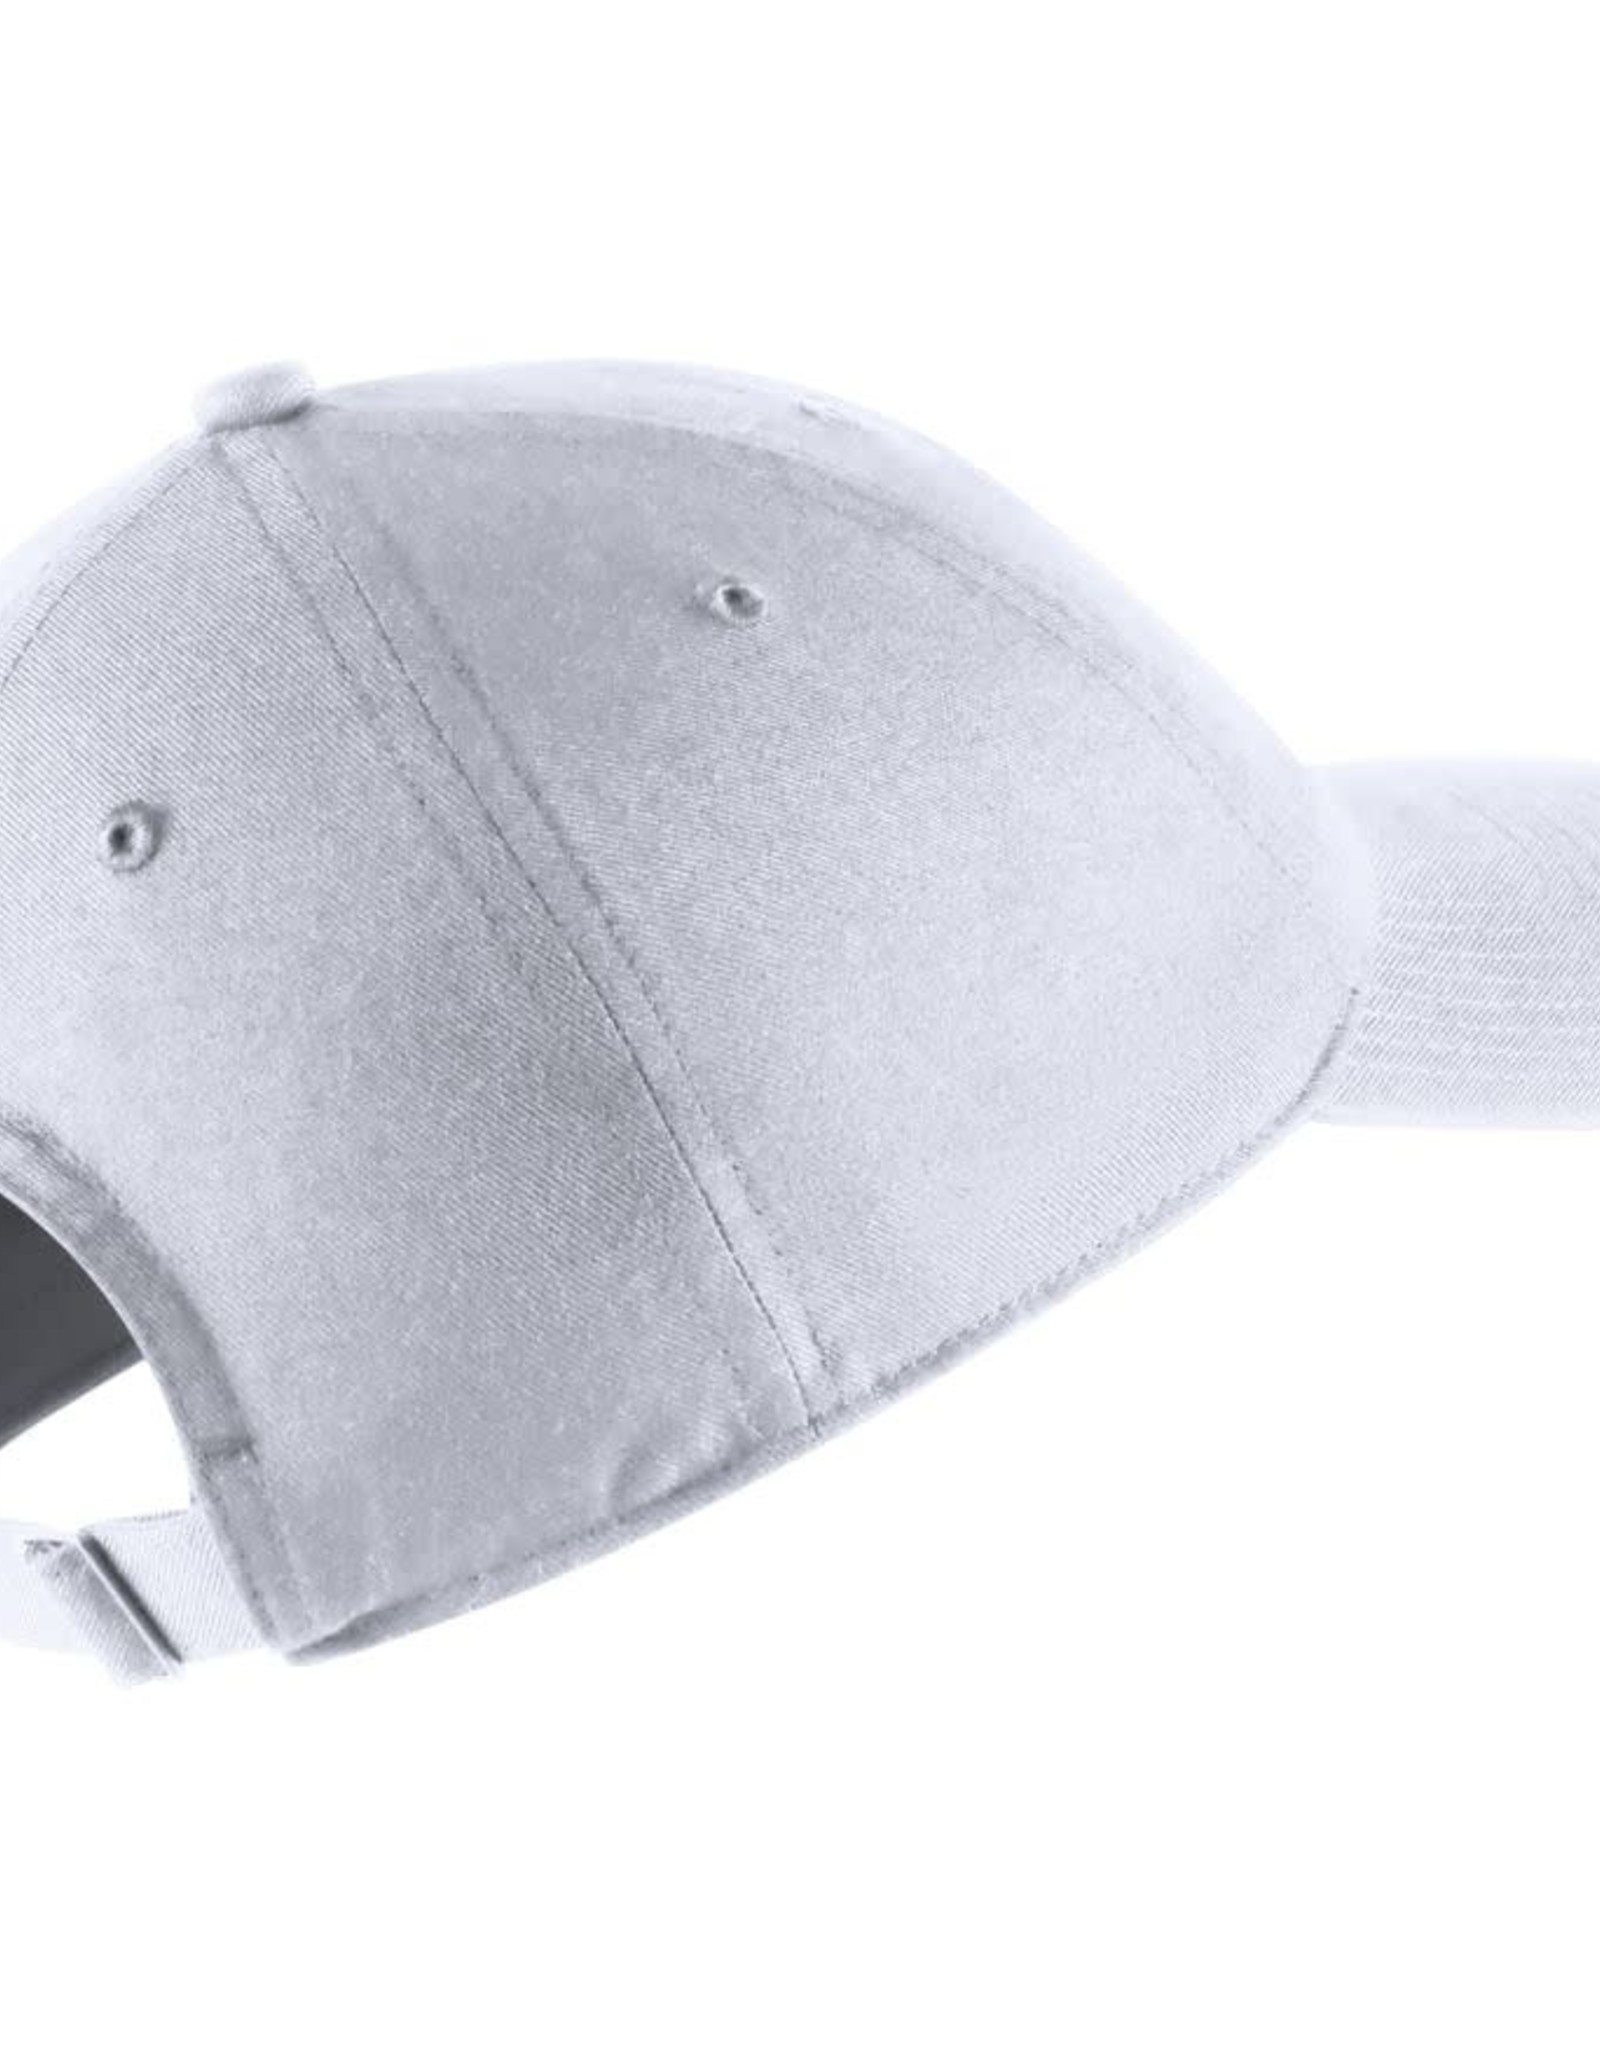 Nike Nike H86 White OU State Shape